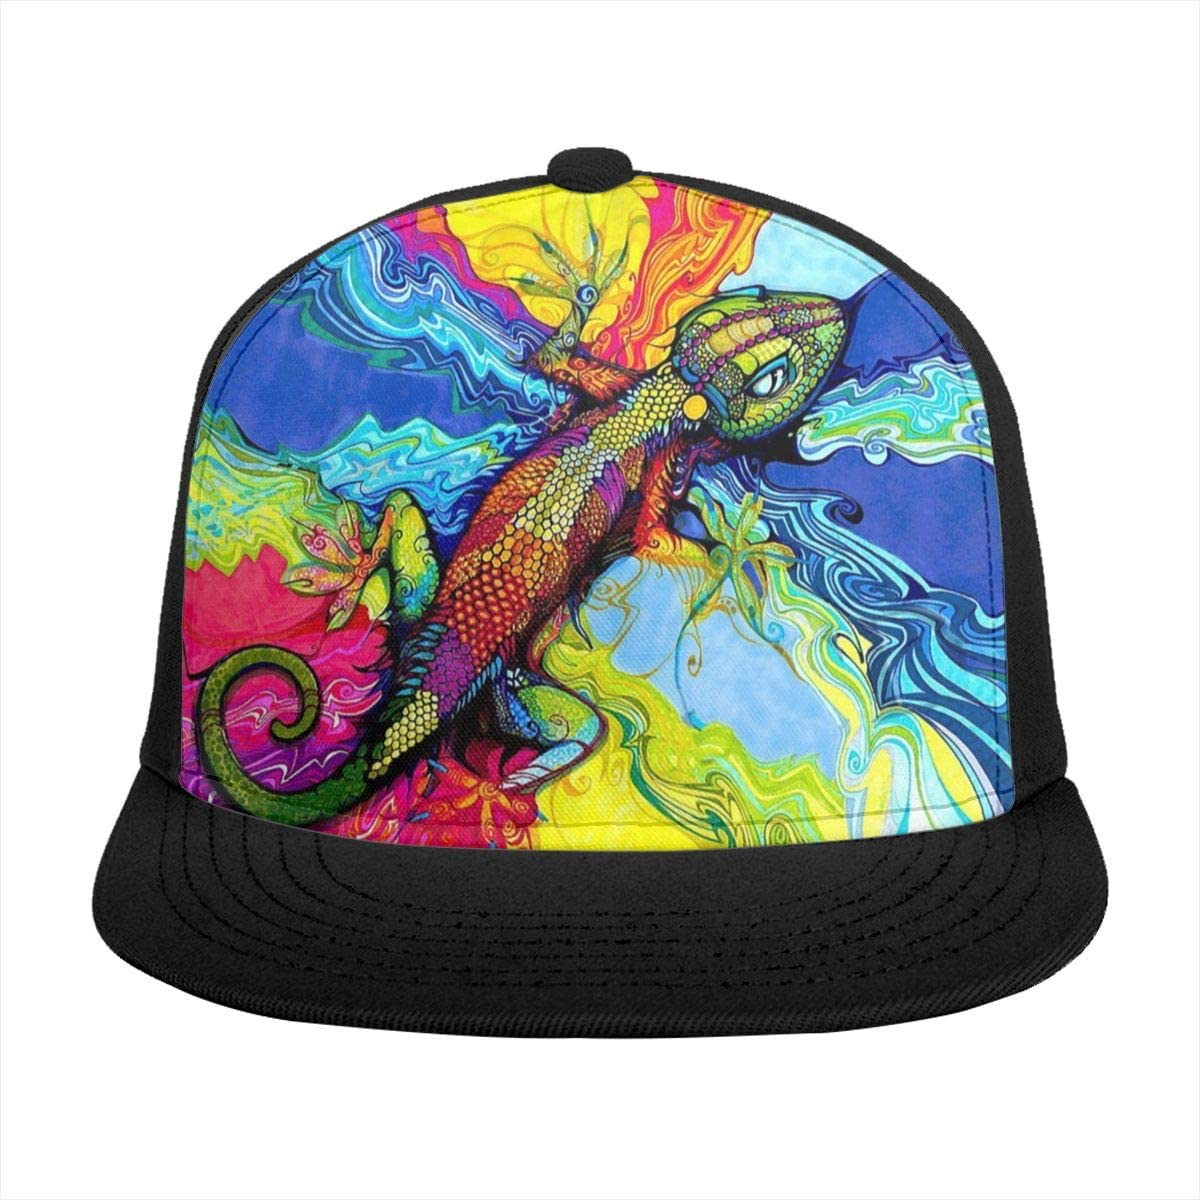 Crazy Talk Colorful Gecko Sun Hats Adjustable Baseball Cap Wide Brim Snapback Trucker Hats for Men Women, Large